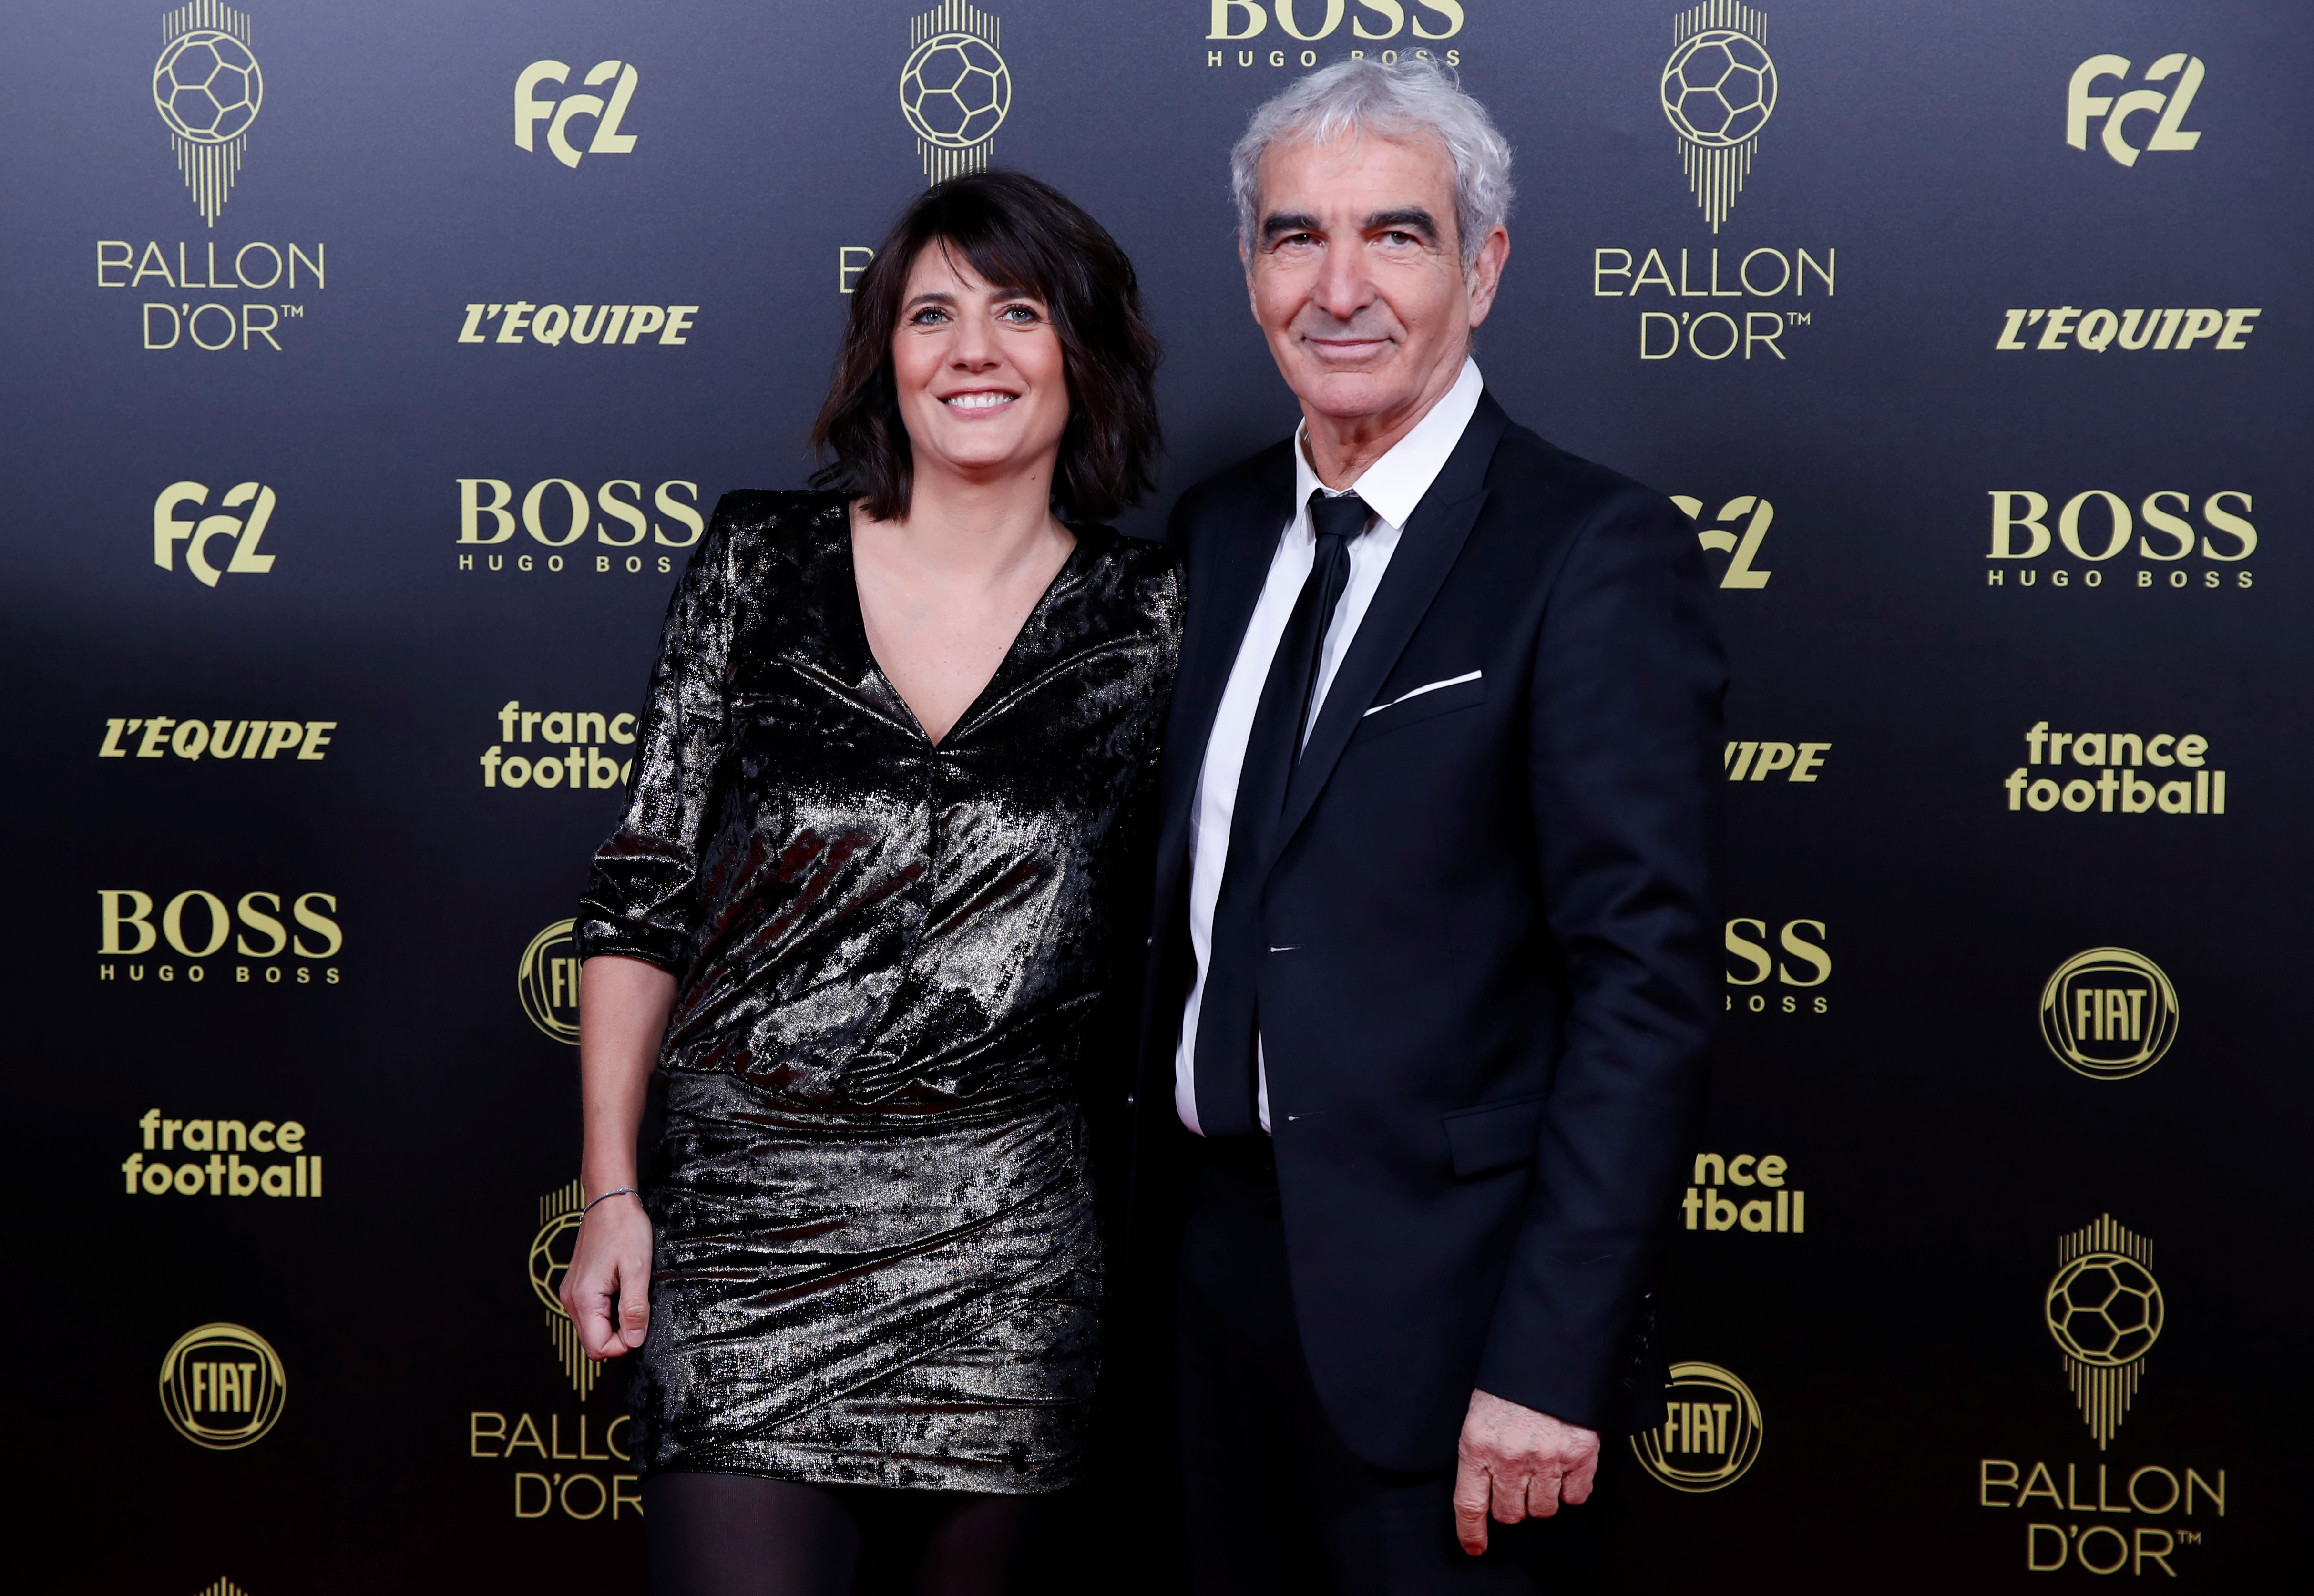 El entrenador Raymond Domenech junto a Estelle Denis